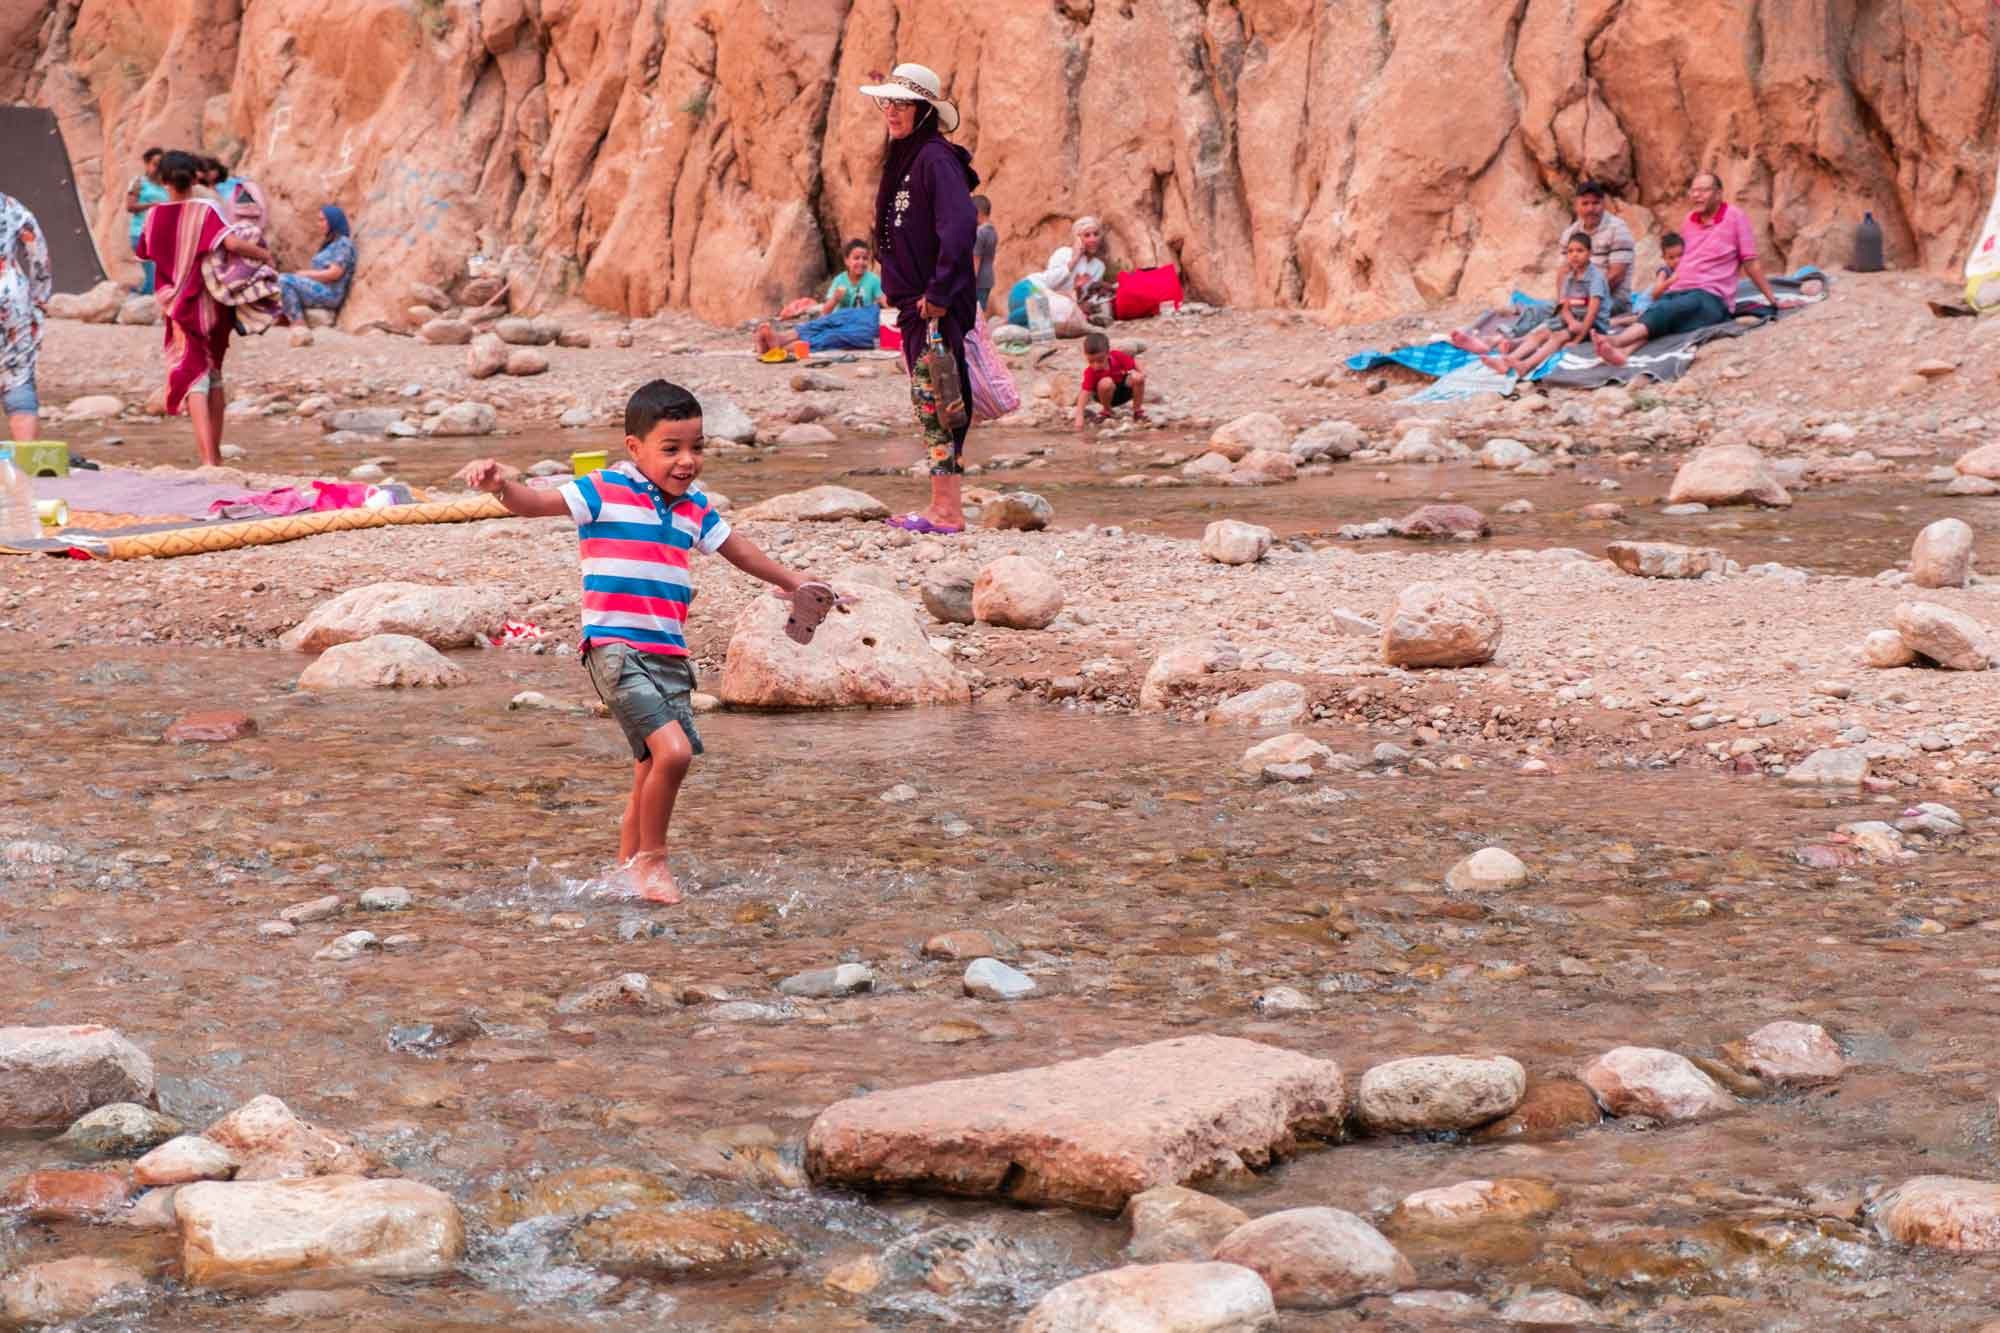 marocco-emozioni-in-5-foto-gole-di-todra